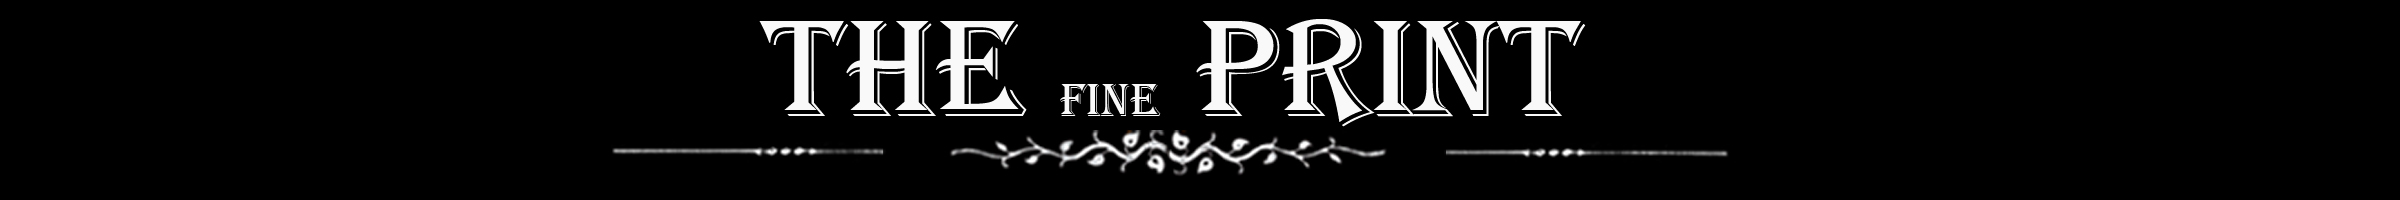 TheFinePrintHeader.jpg